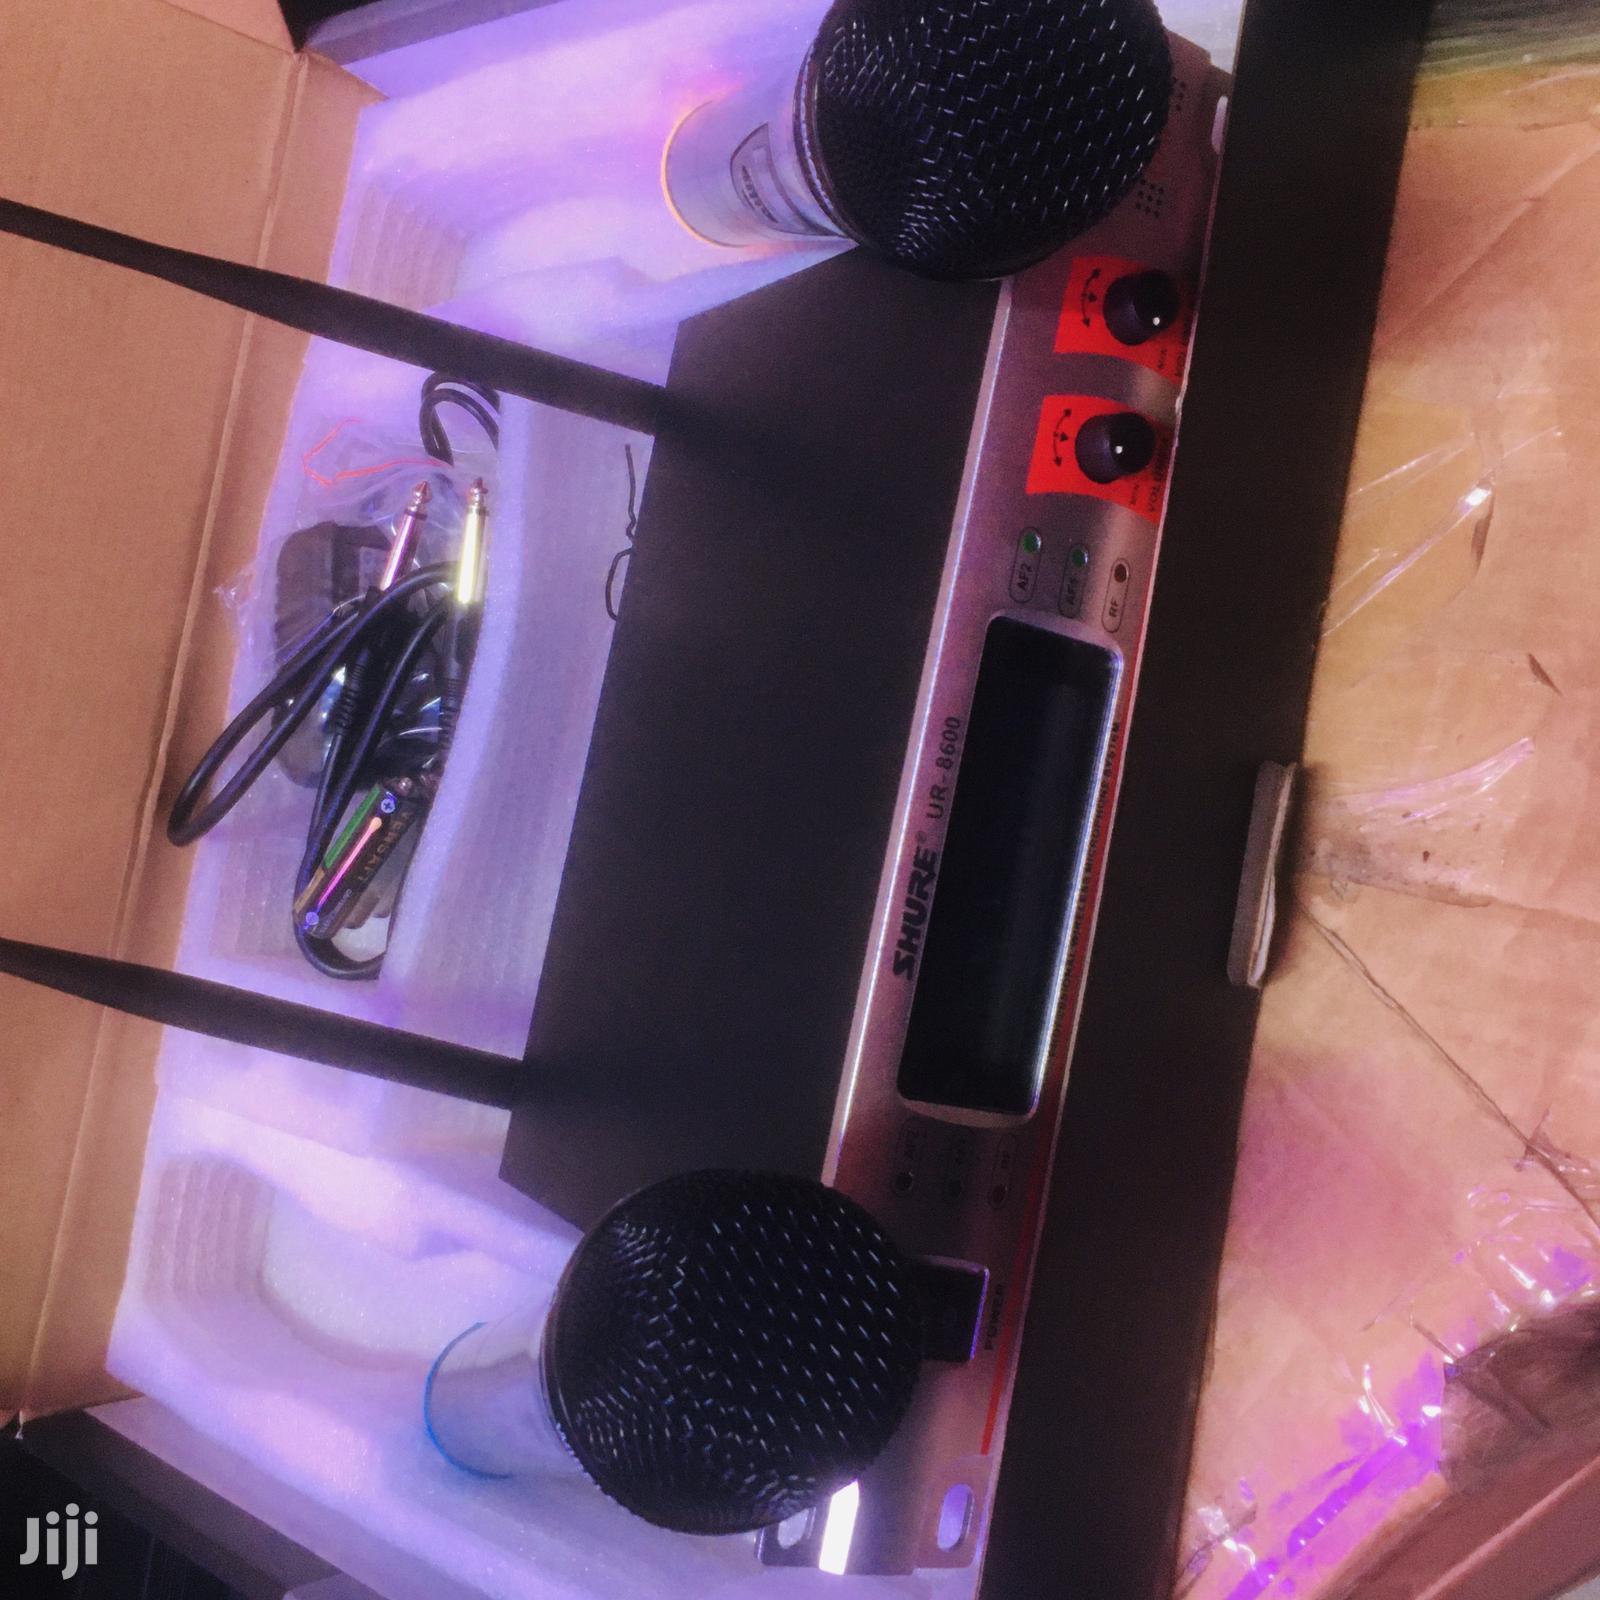 Shure Wireless Microphone | Audio & Music Equipment for sale in Kampala, Central Region, Uganda